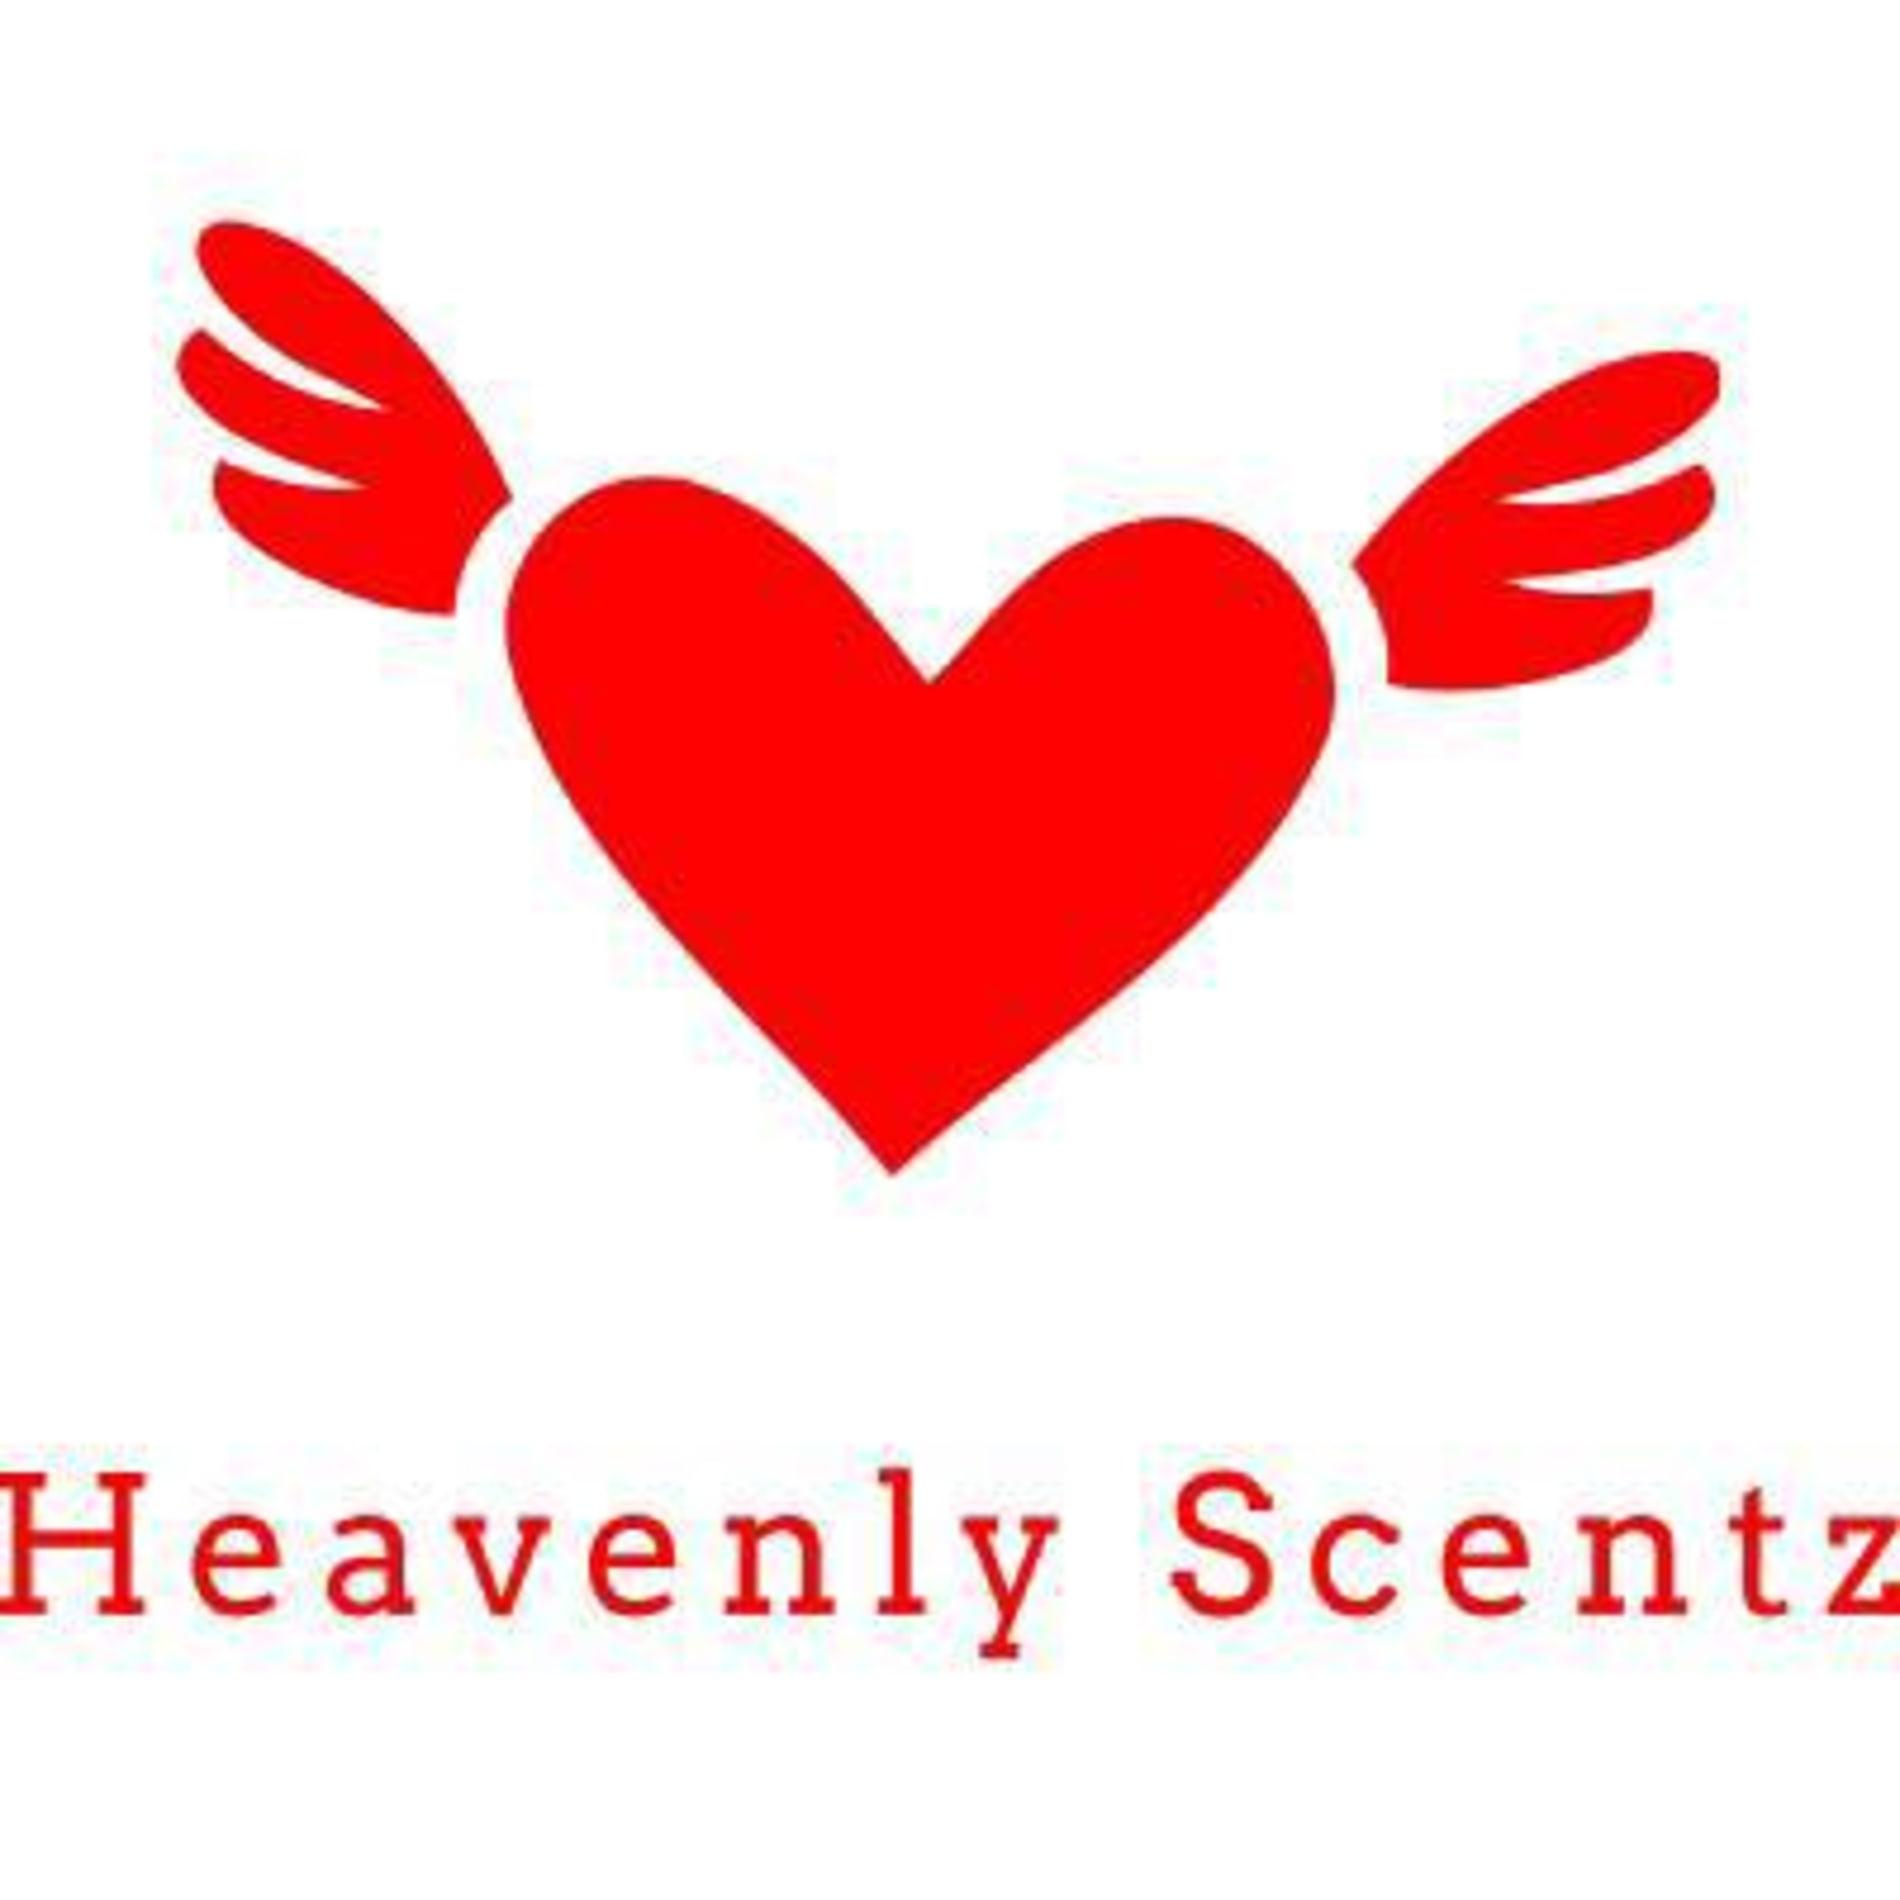 Heavenly Scentz